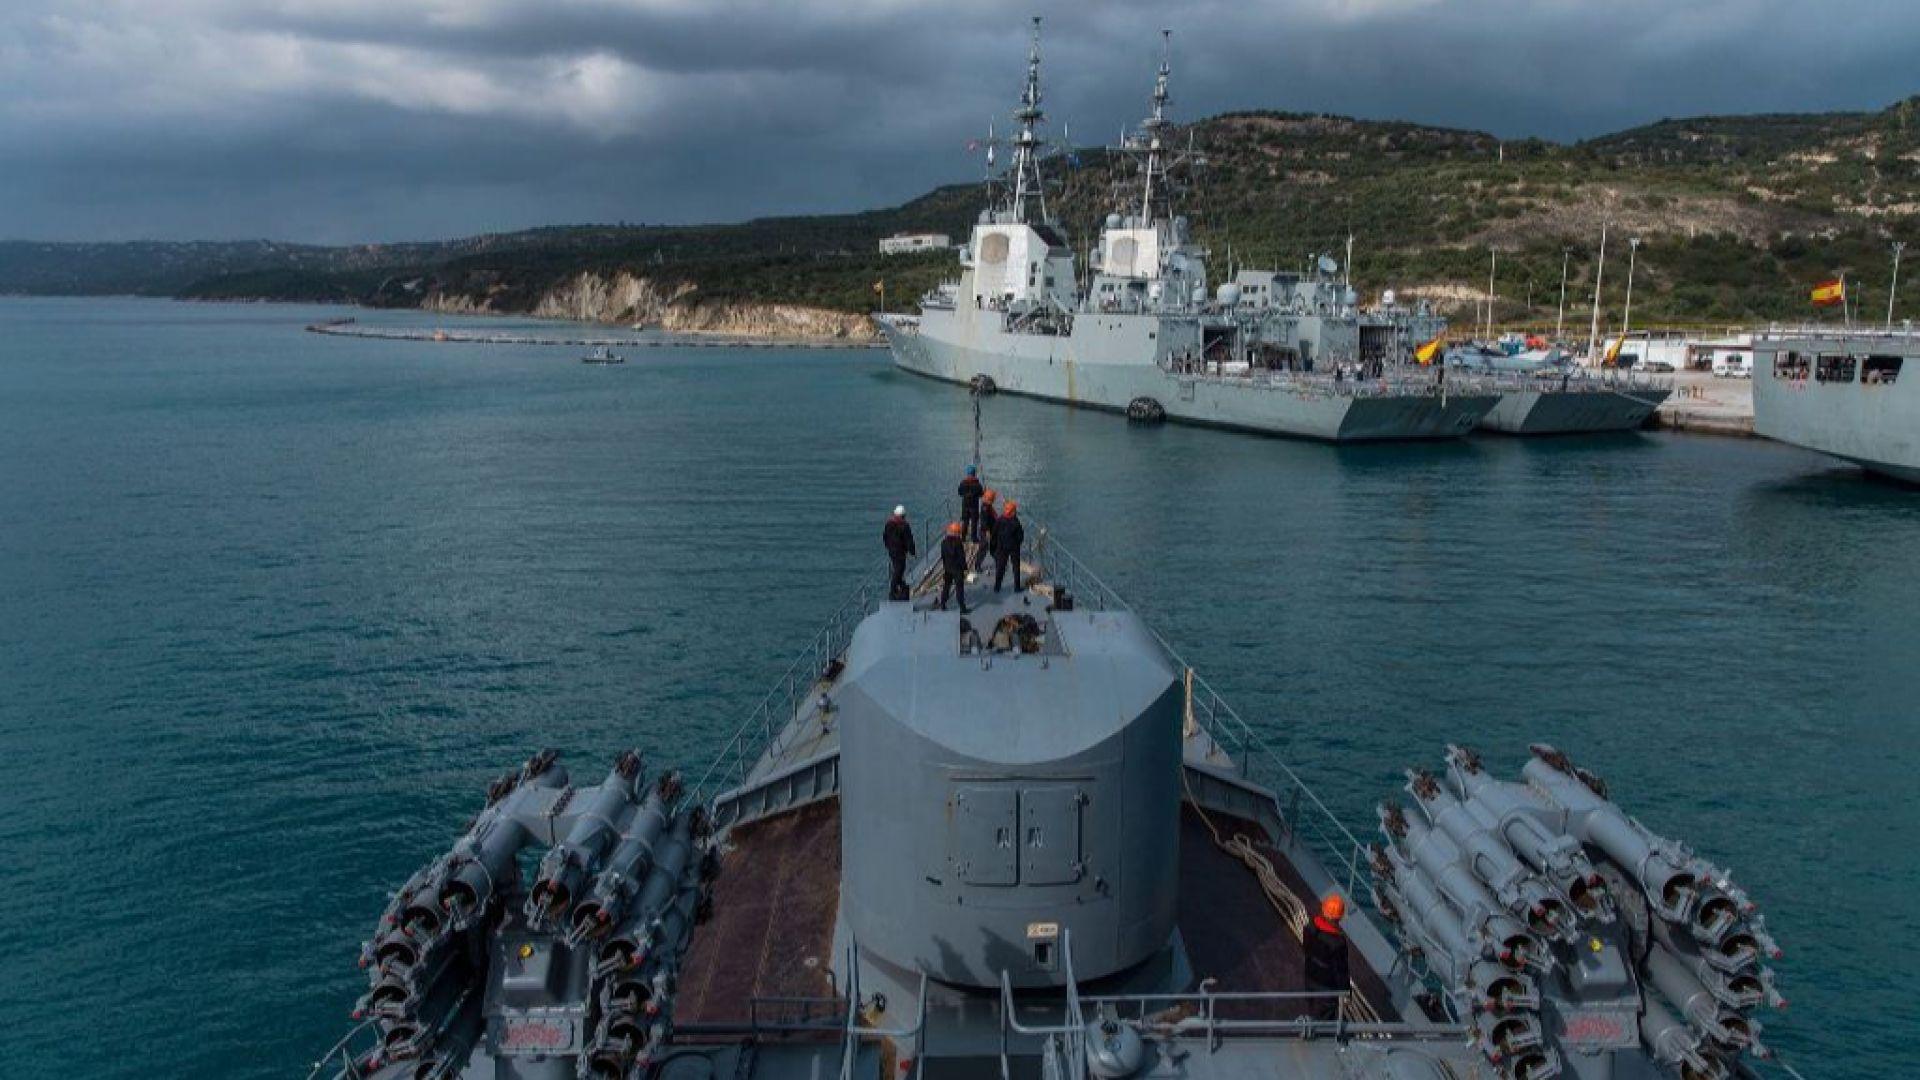 "Испански адмирал даде висока оценка на работата на фрегатата ни ""Смели"" (снимки)"